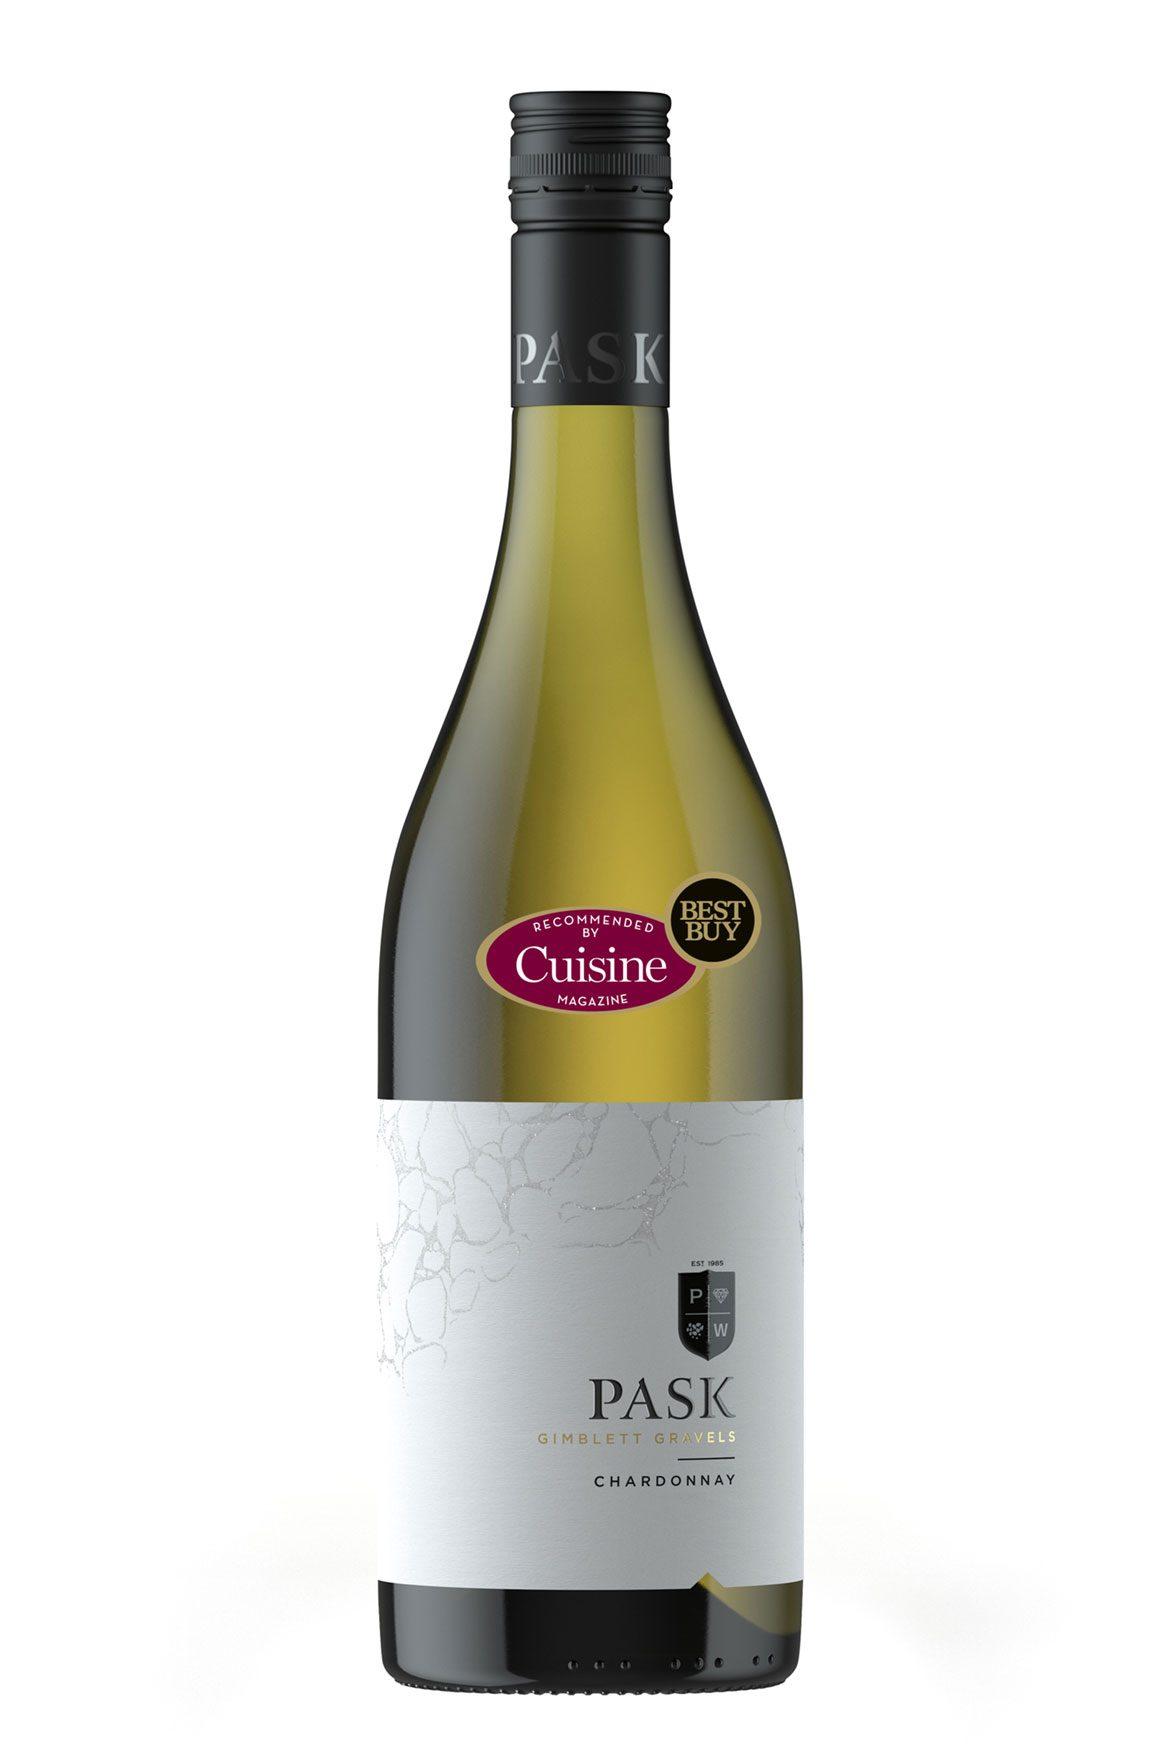 Pask Gimblett Gravels Chardonnay 2018 (Hawke's Bay)